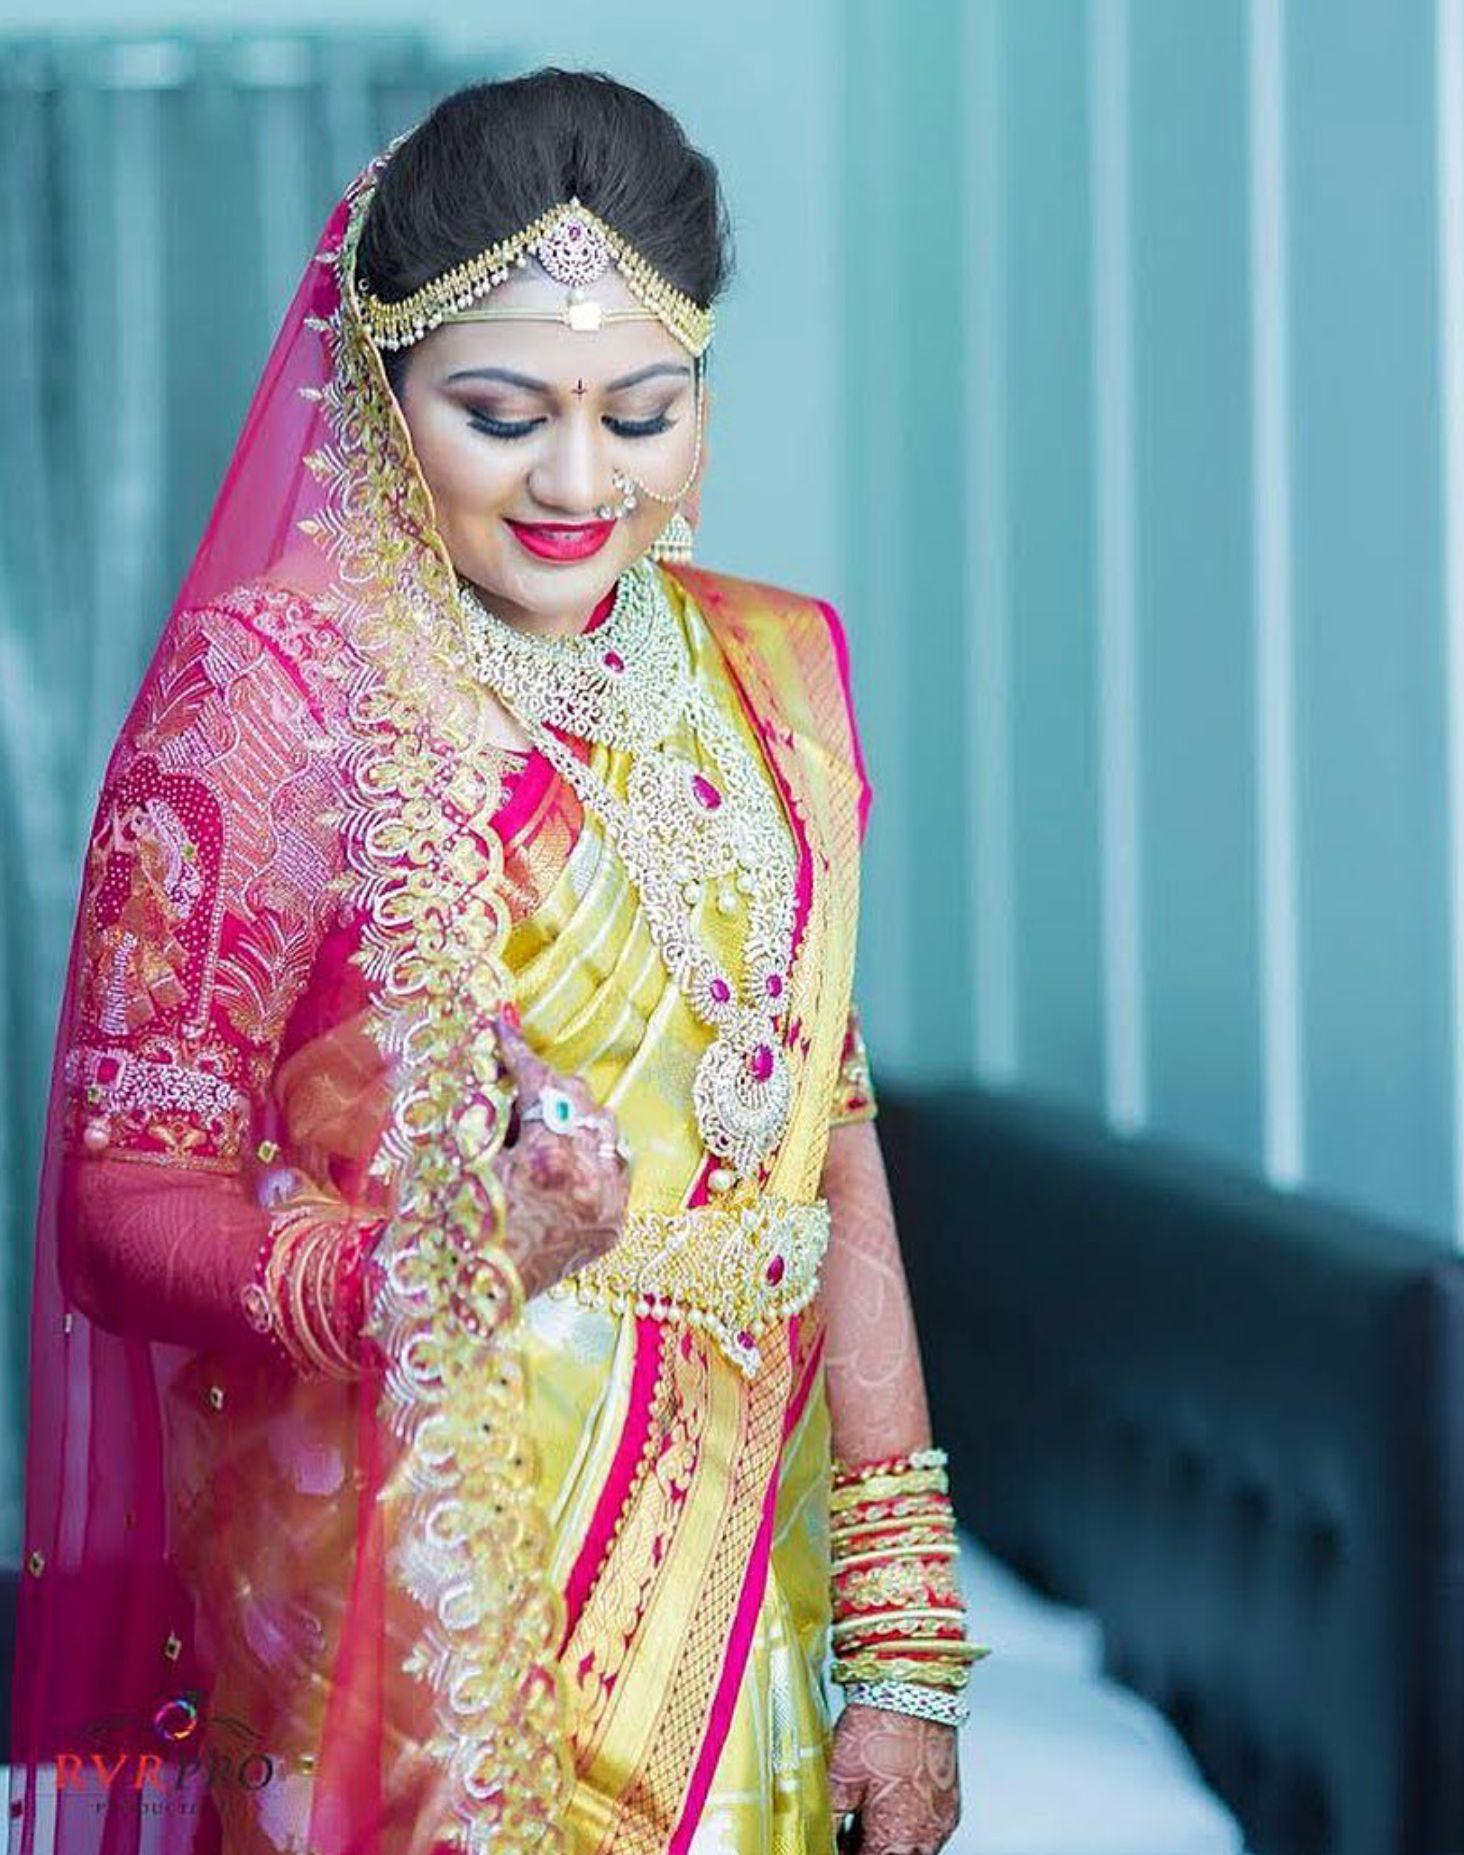 Unusual Indian Bride Groom Wedding Dress Pictures Inspiration ...